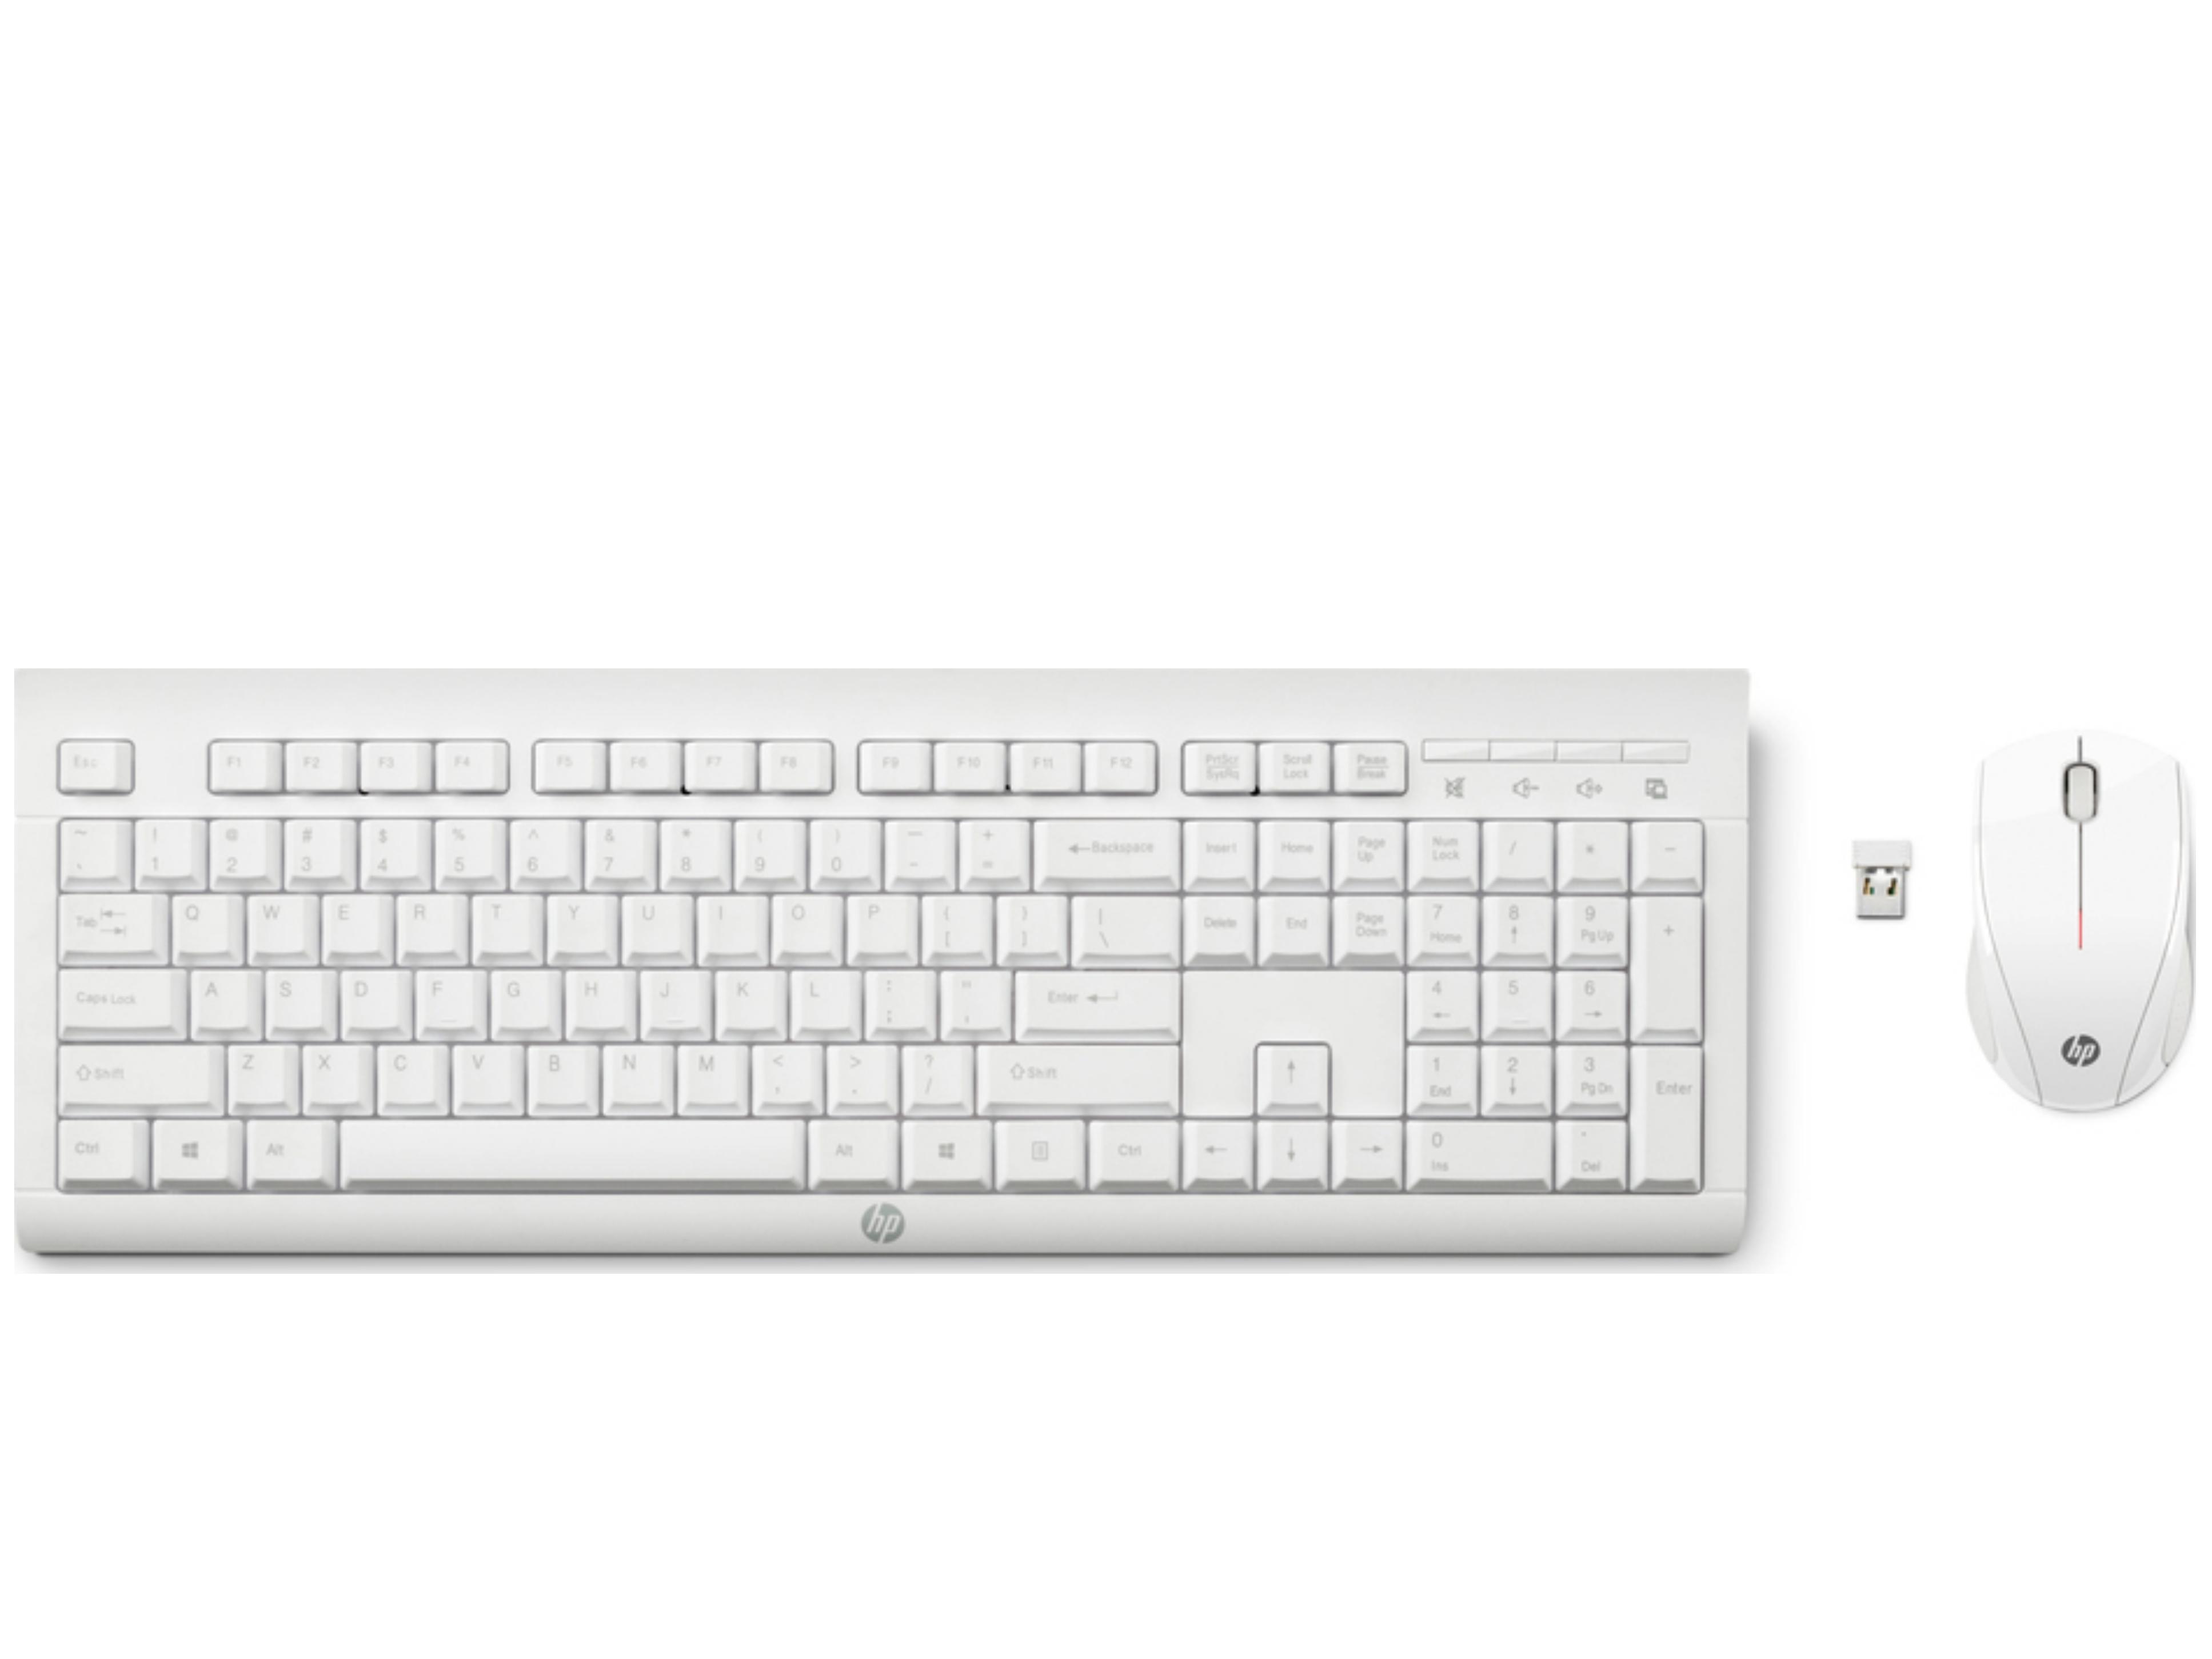 HP C2710 Ασύρματο Σετ Πληκτρολόγιο & Ποντίκι Ελληνικό